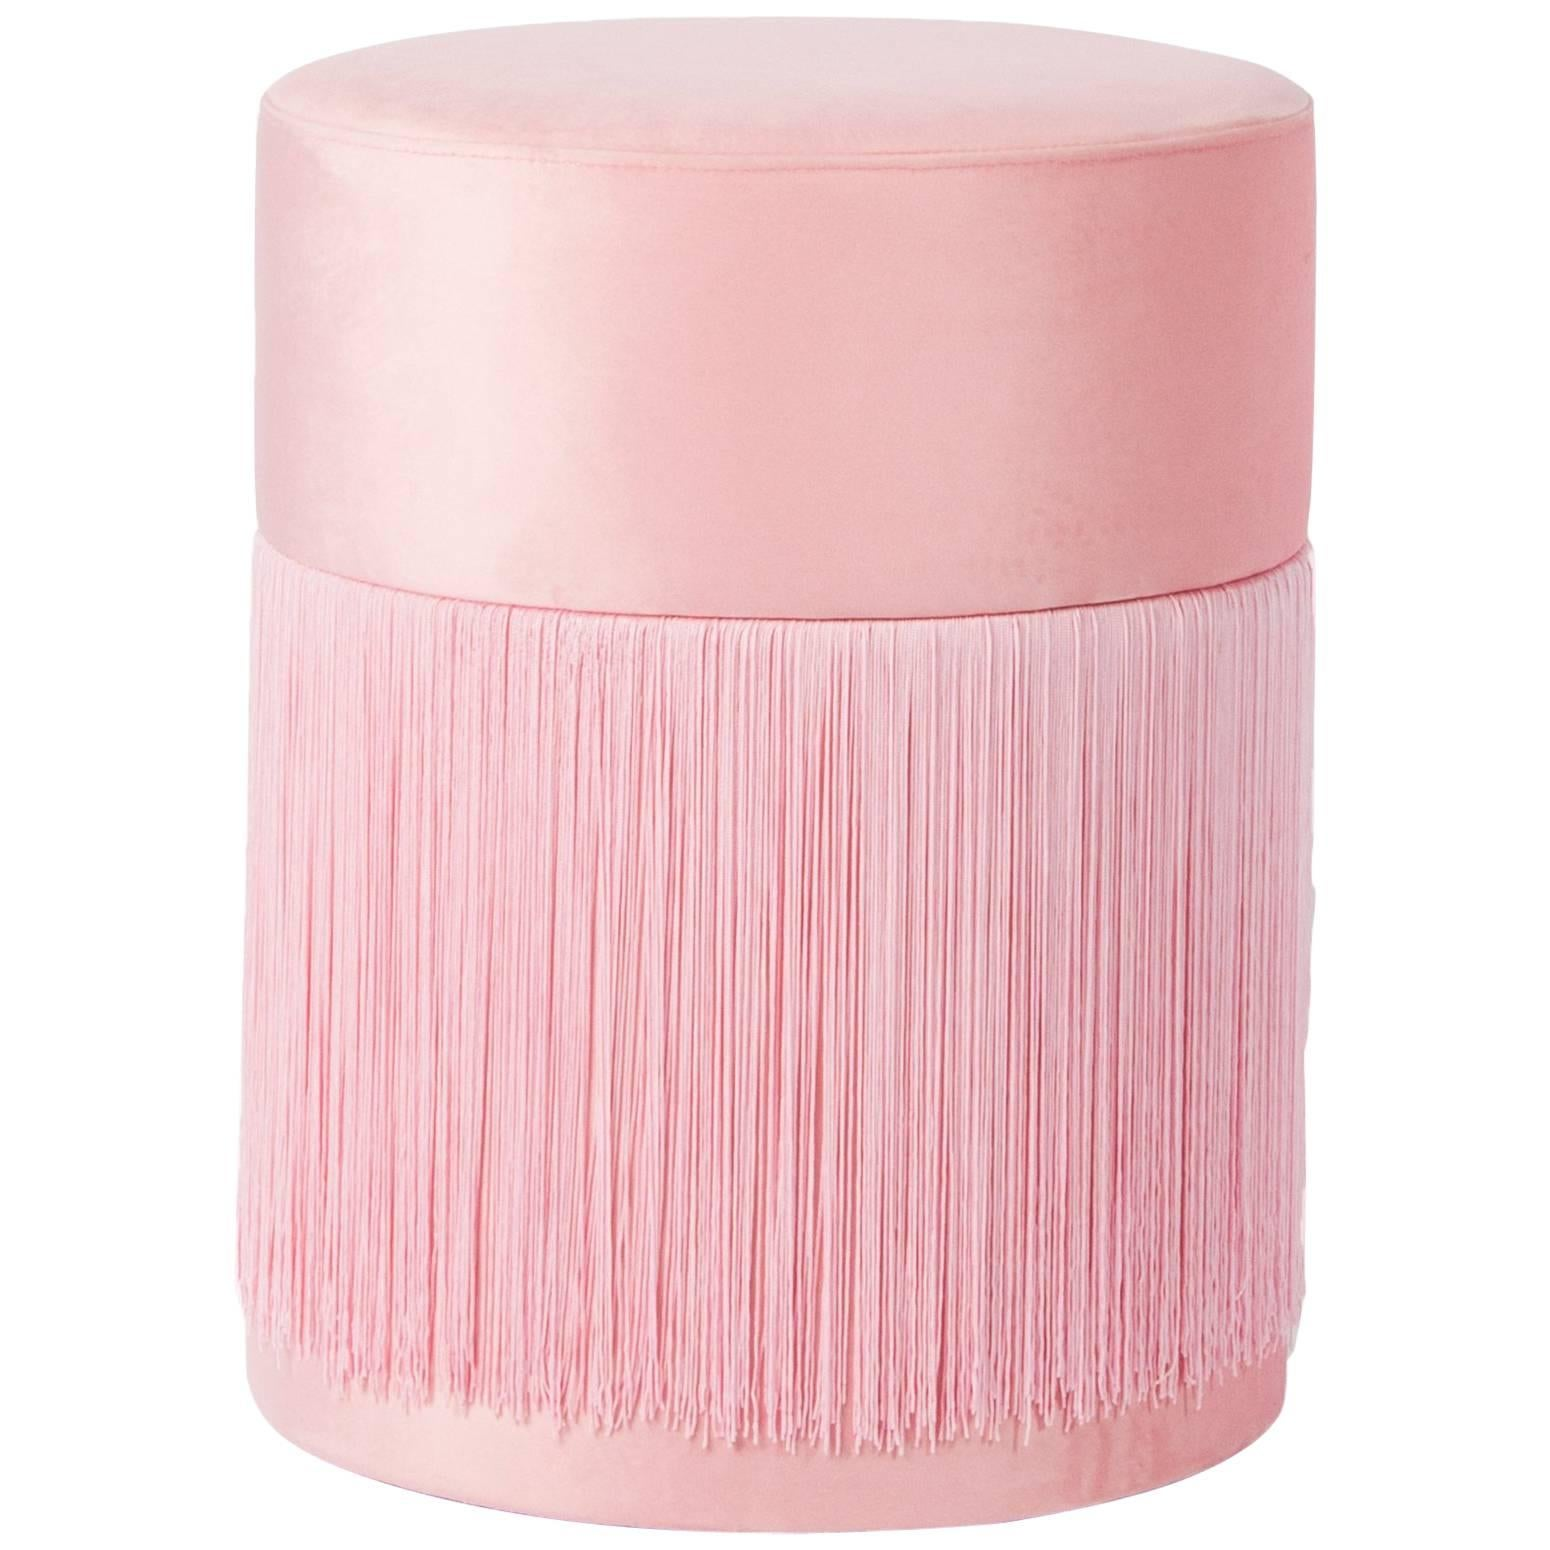 Pouf Pill Pink in Velvet Upholstery with Fringes